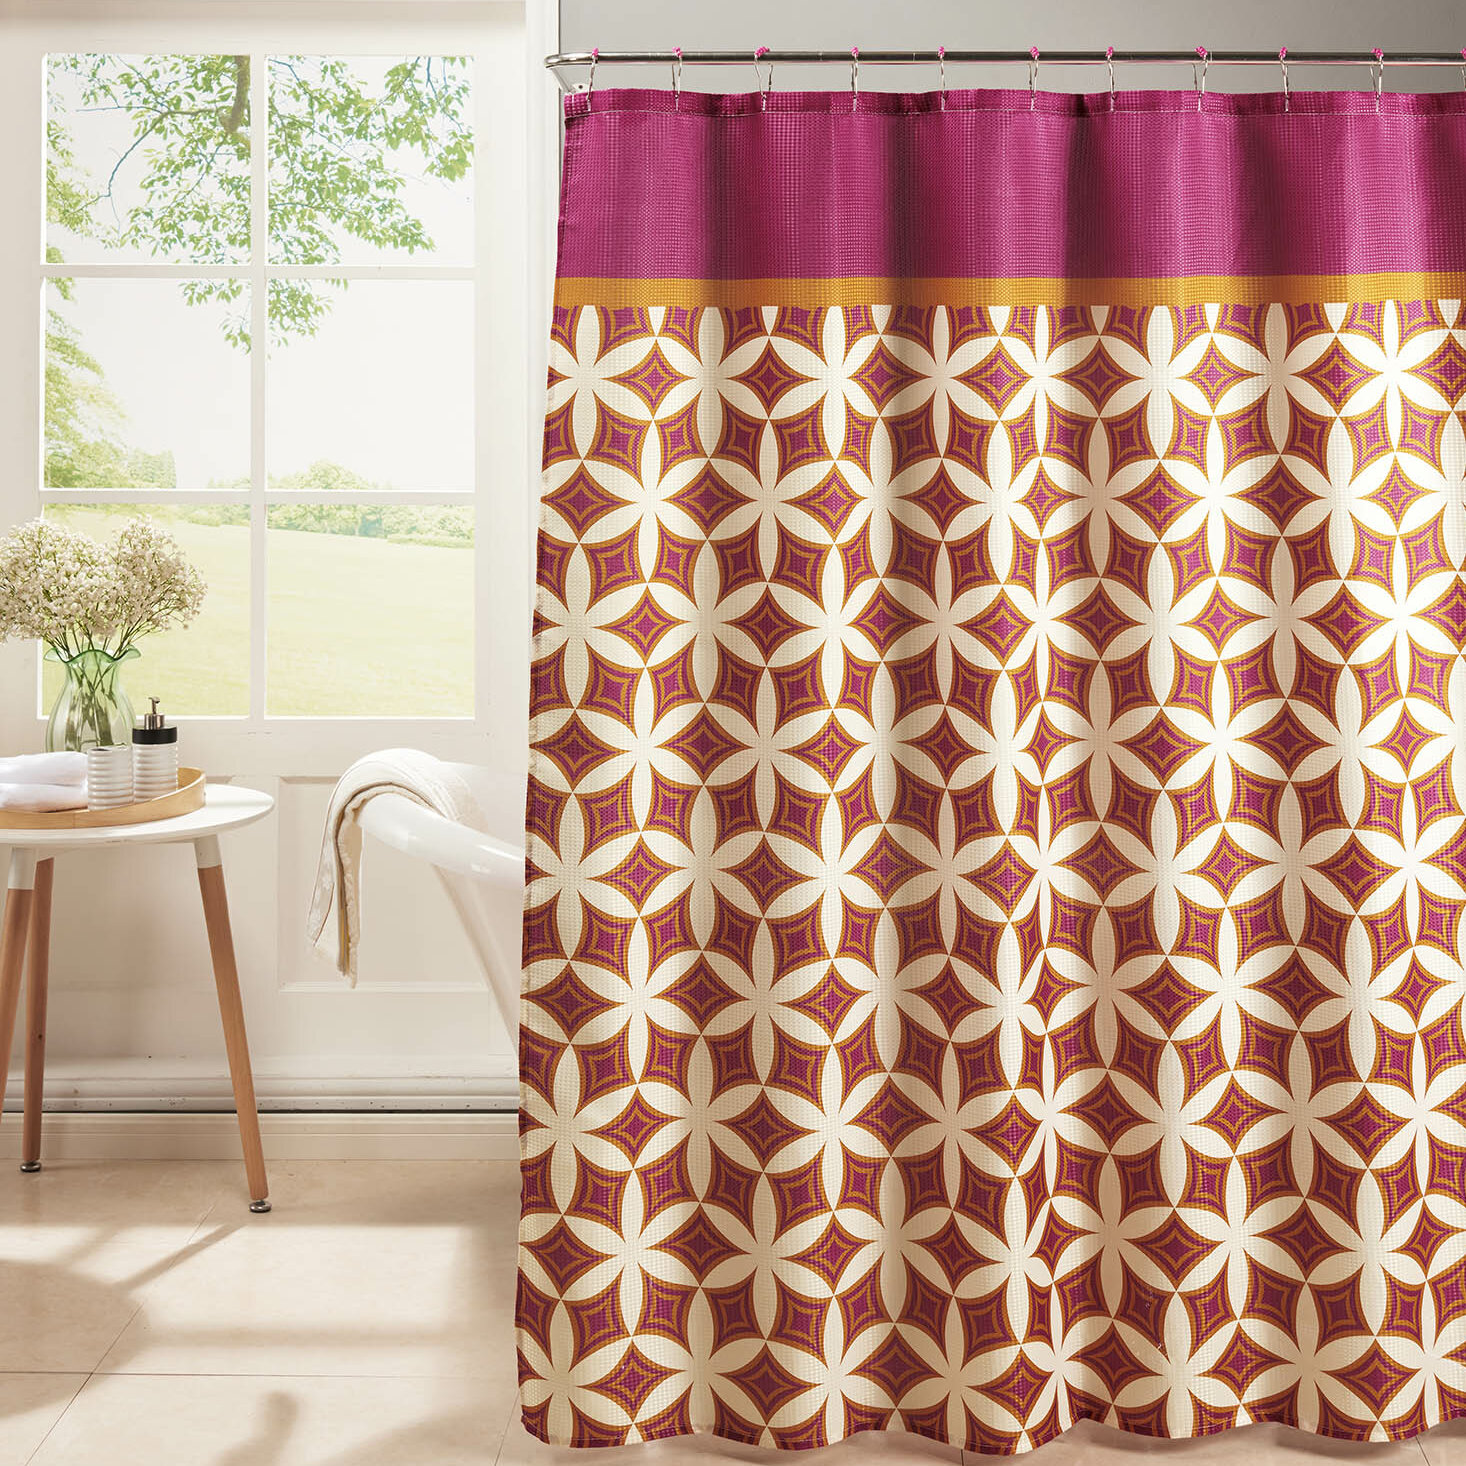 Bath Studio Diamond Weave Textured Shower Curtain Set